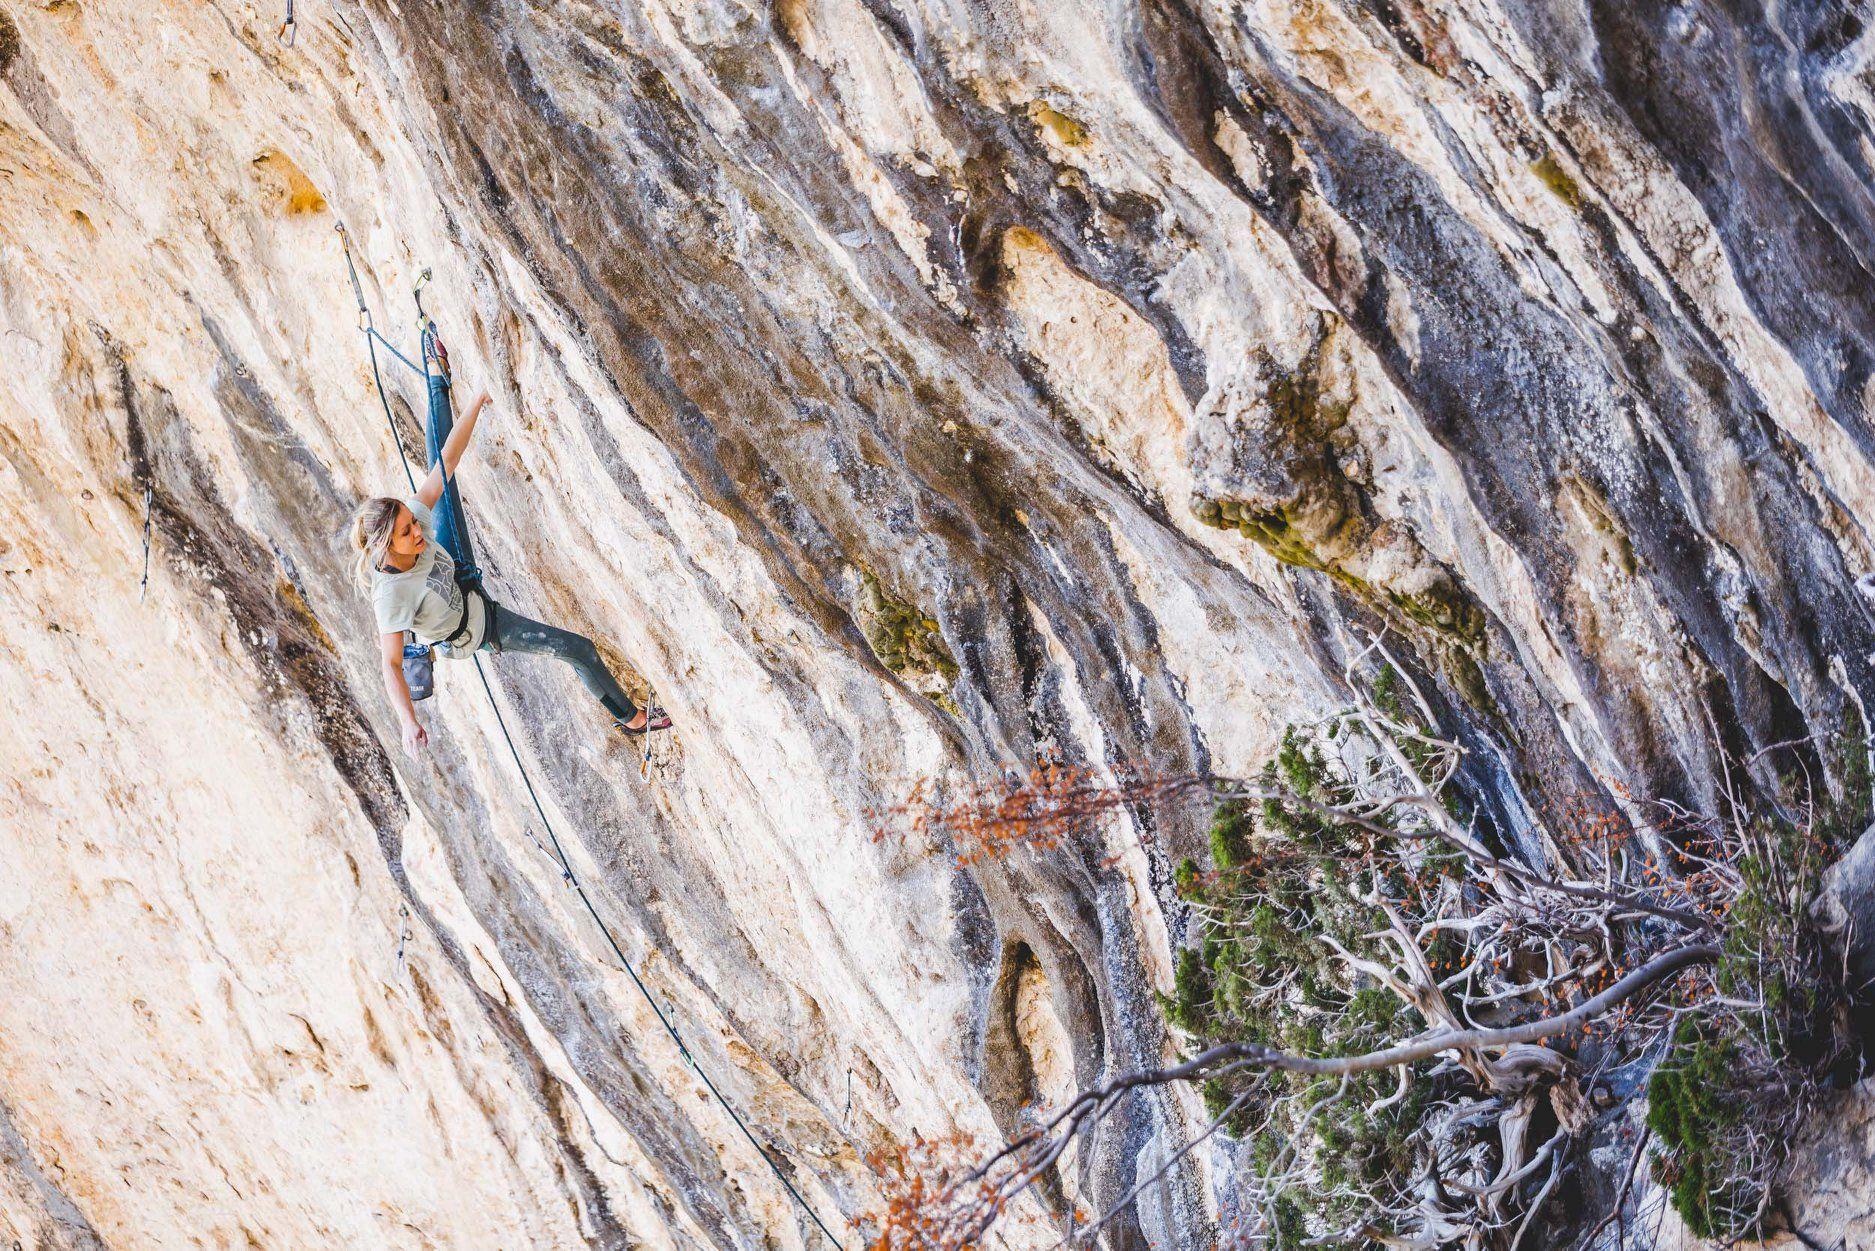 Skylotec Klettergurt Decathlon : Klettergurt test: testbericht petzl adjama mit